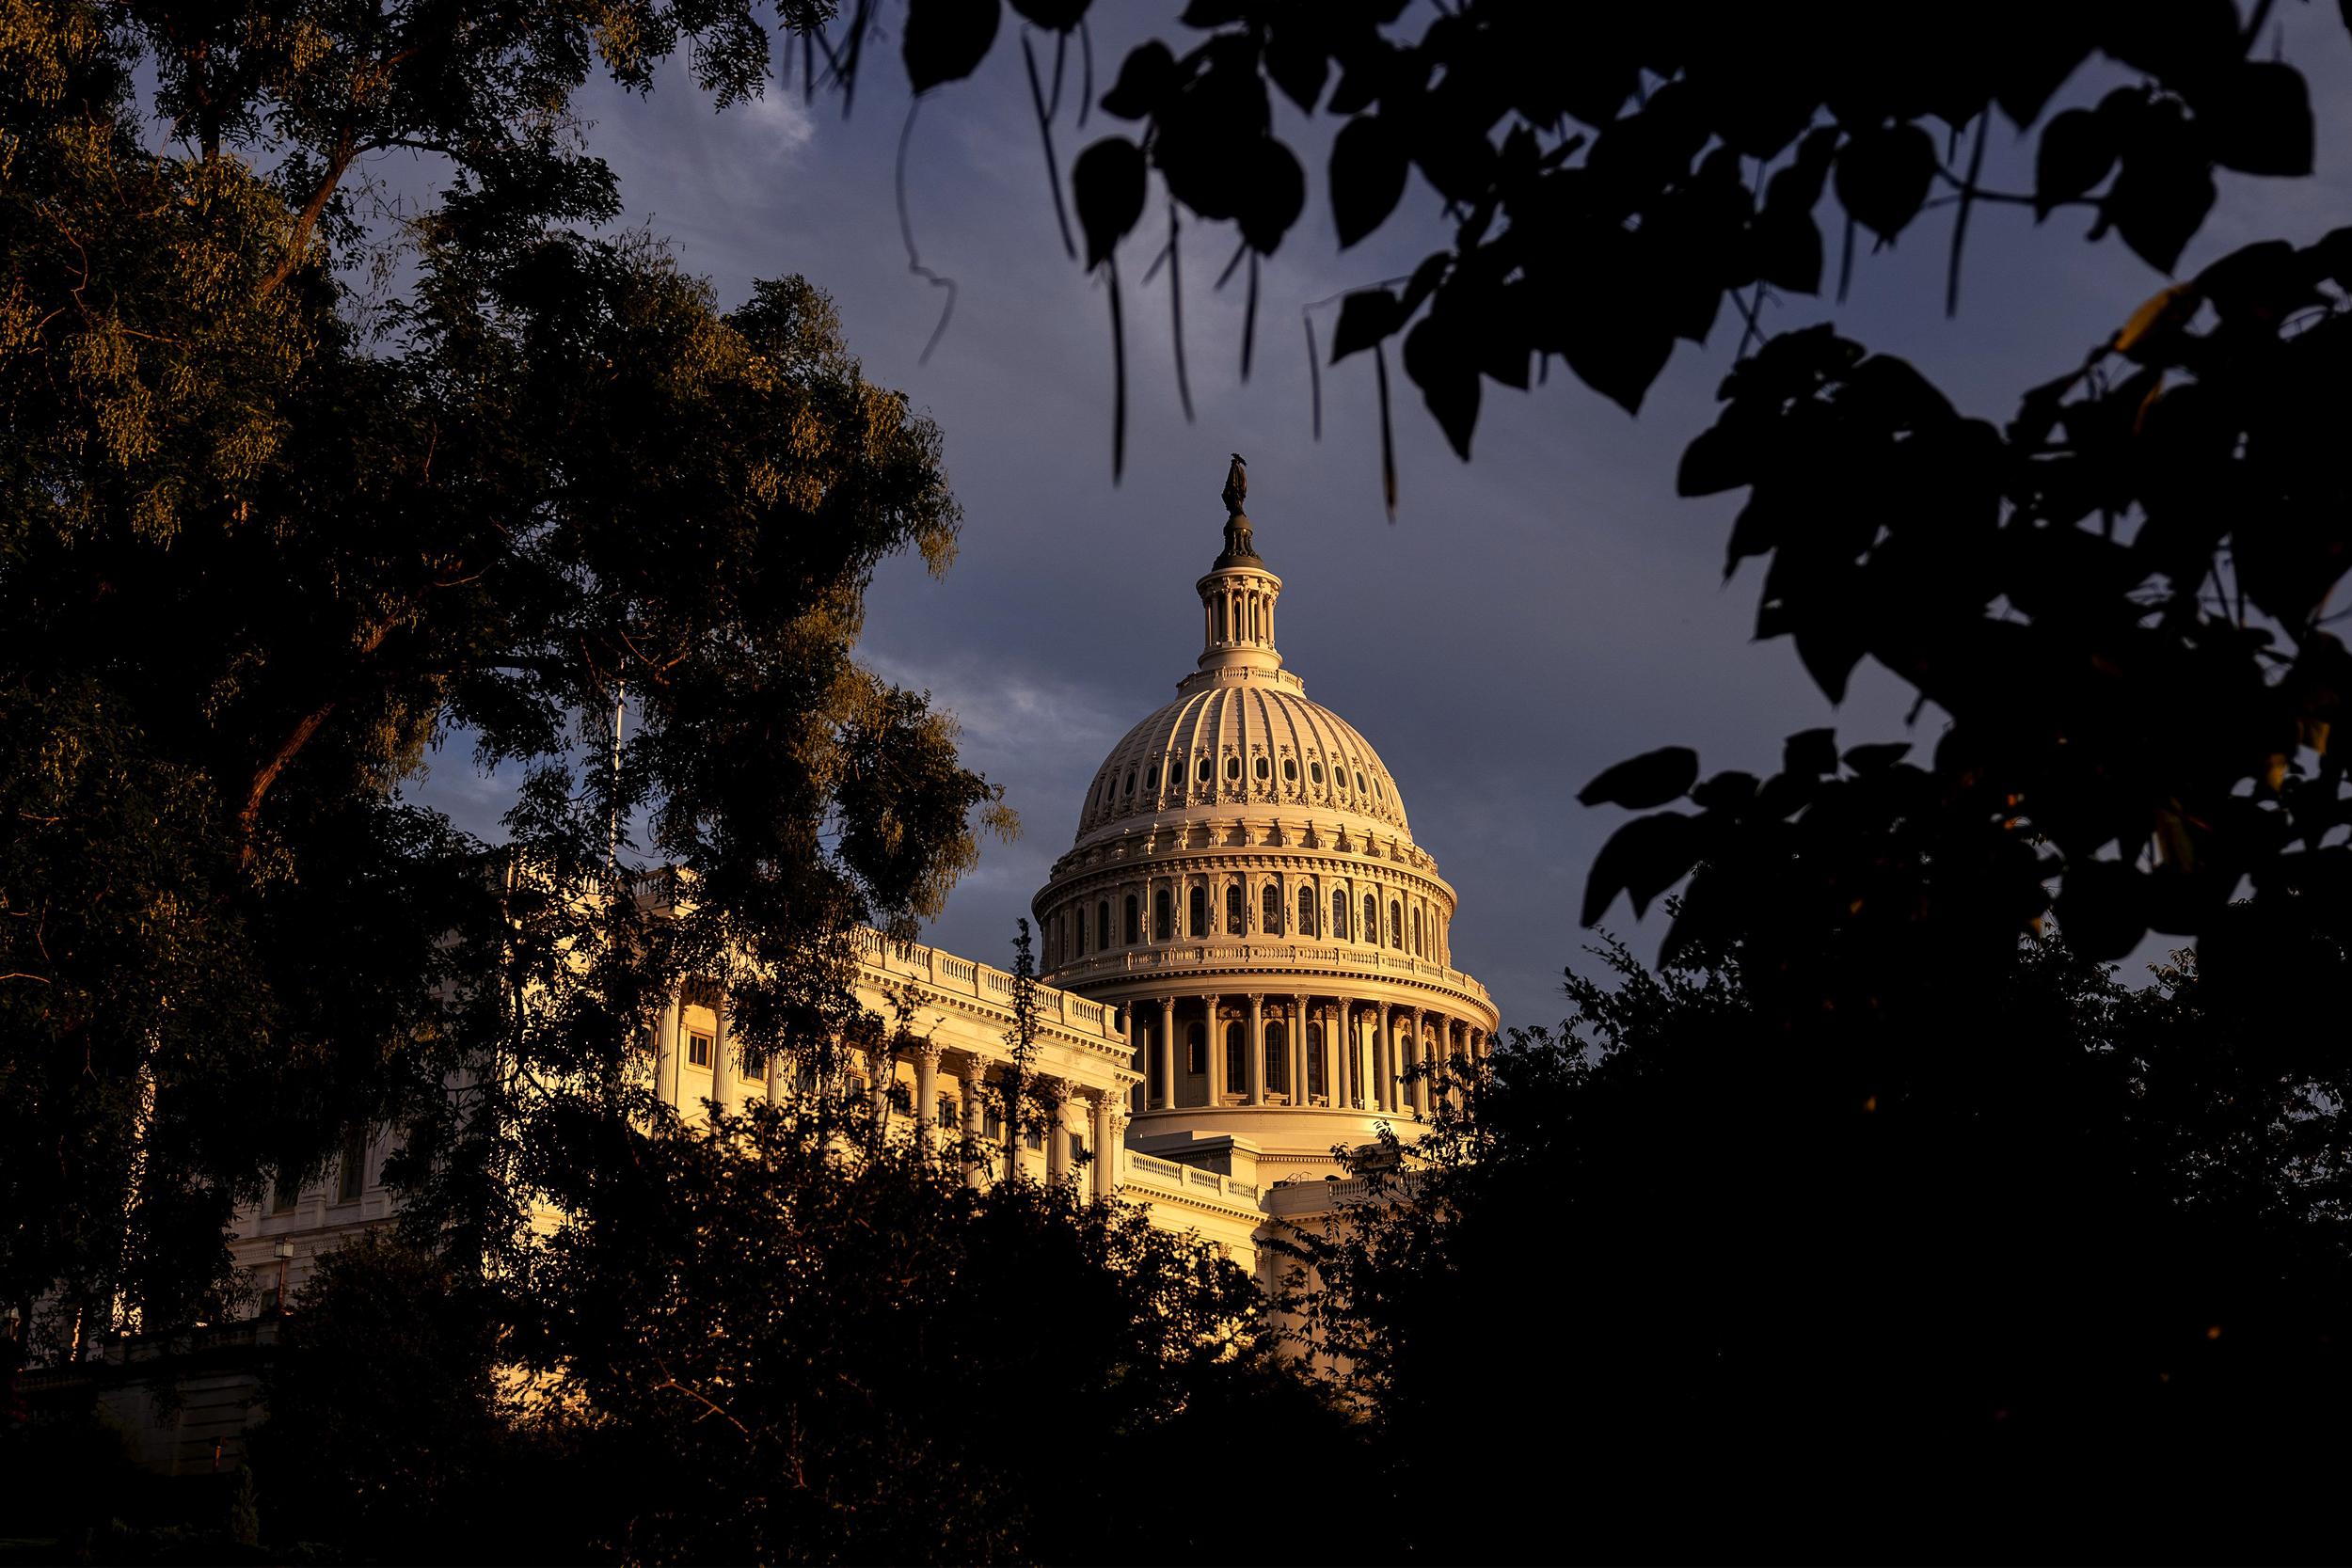 Government shutdown deadline looms as Senate prepares to vote on funding bill